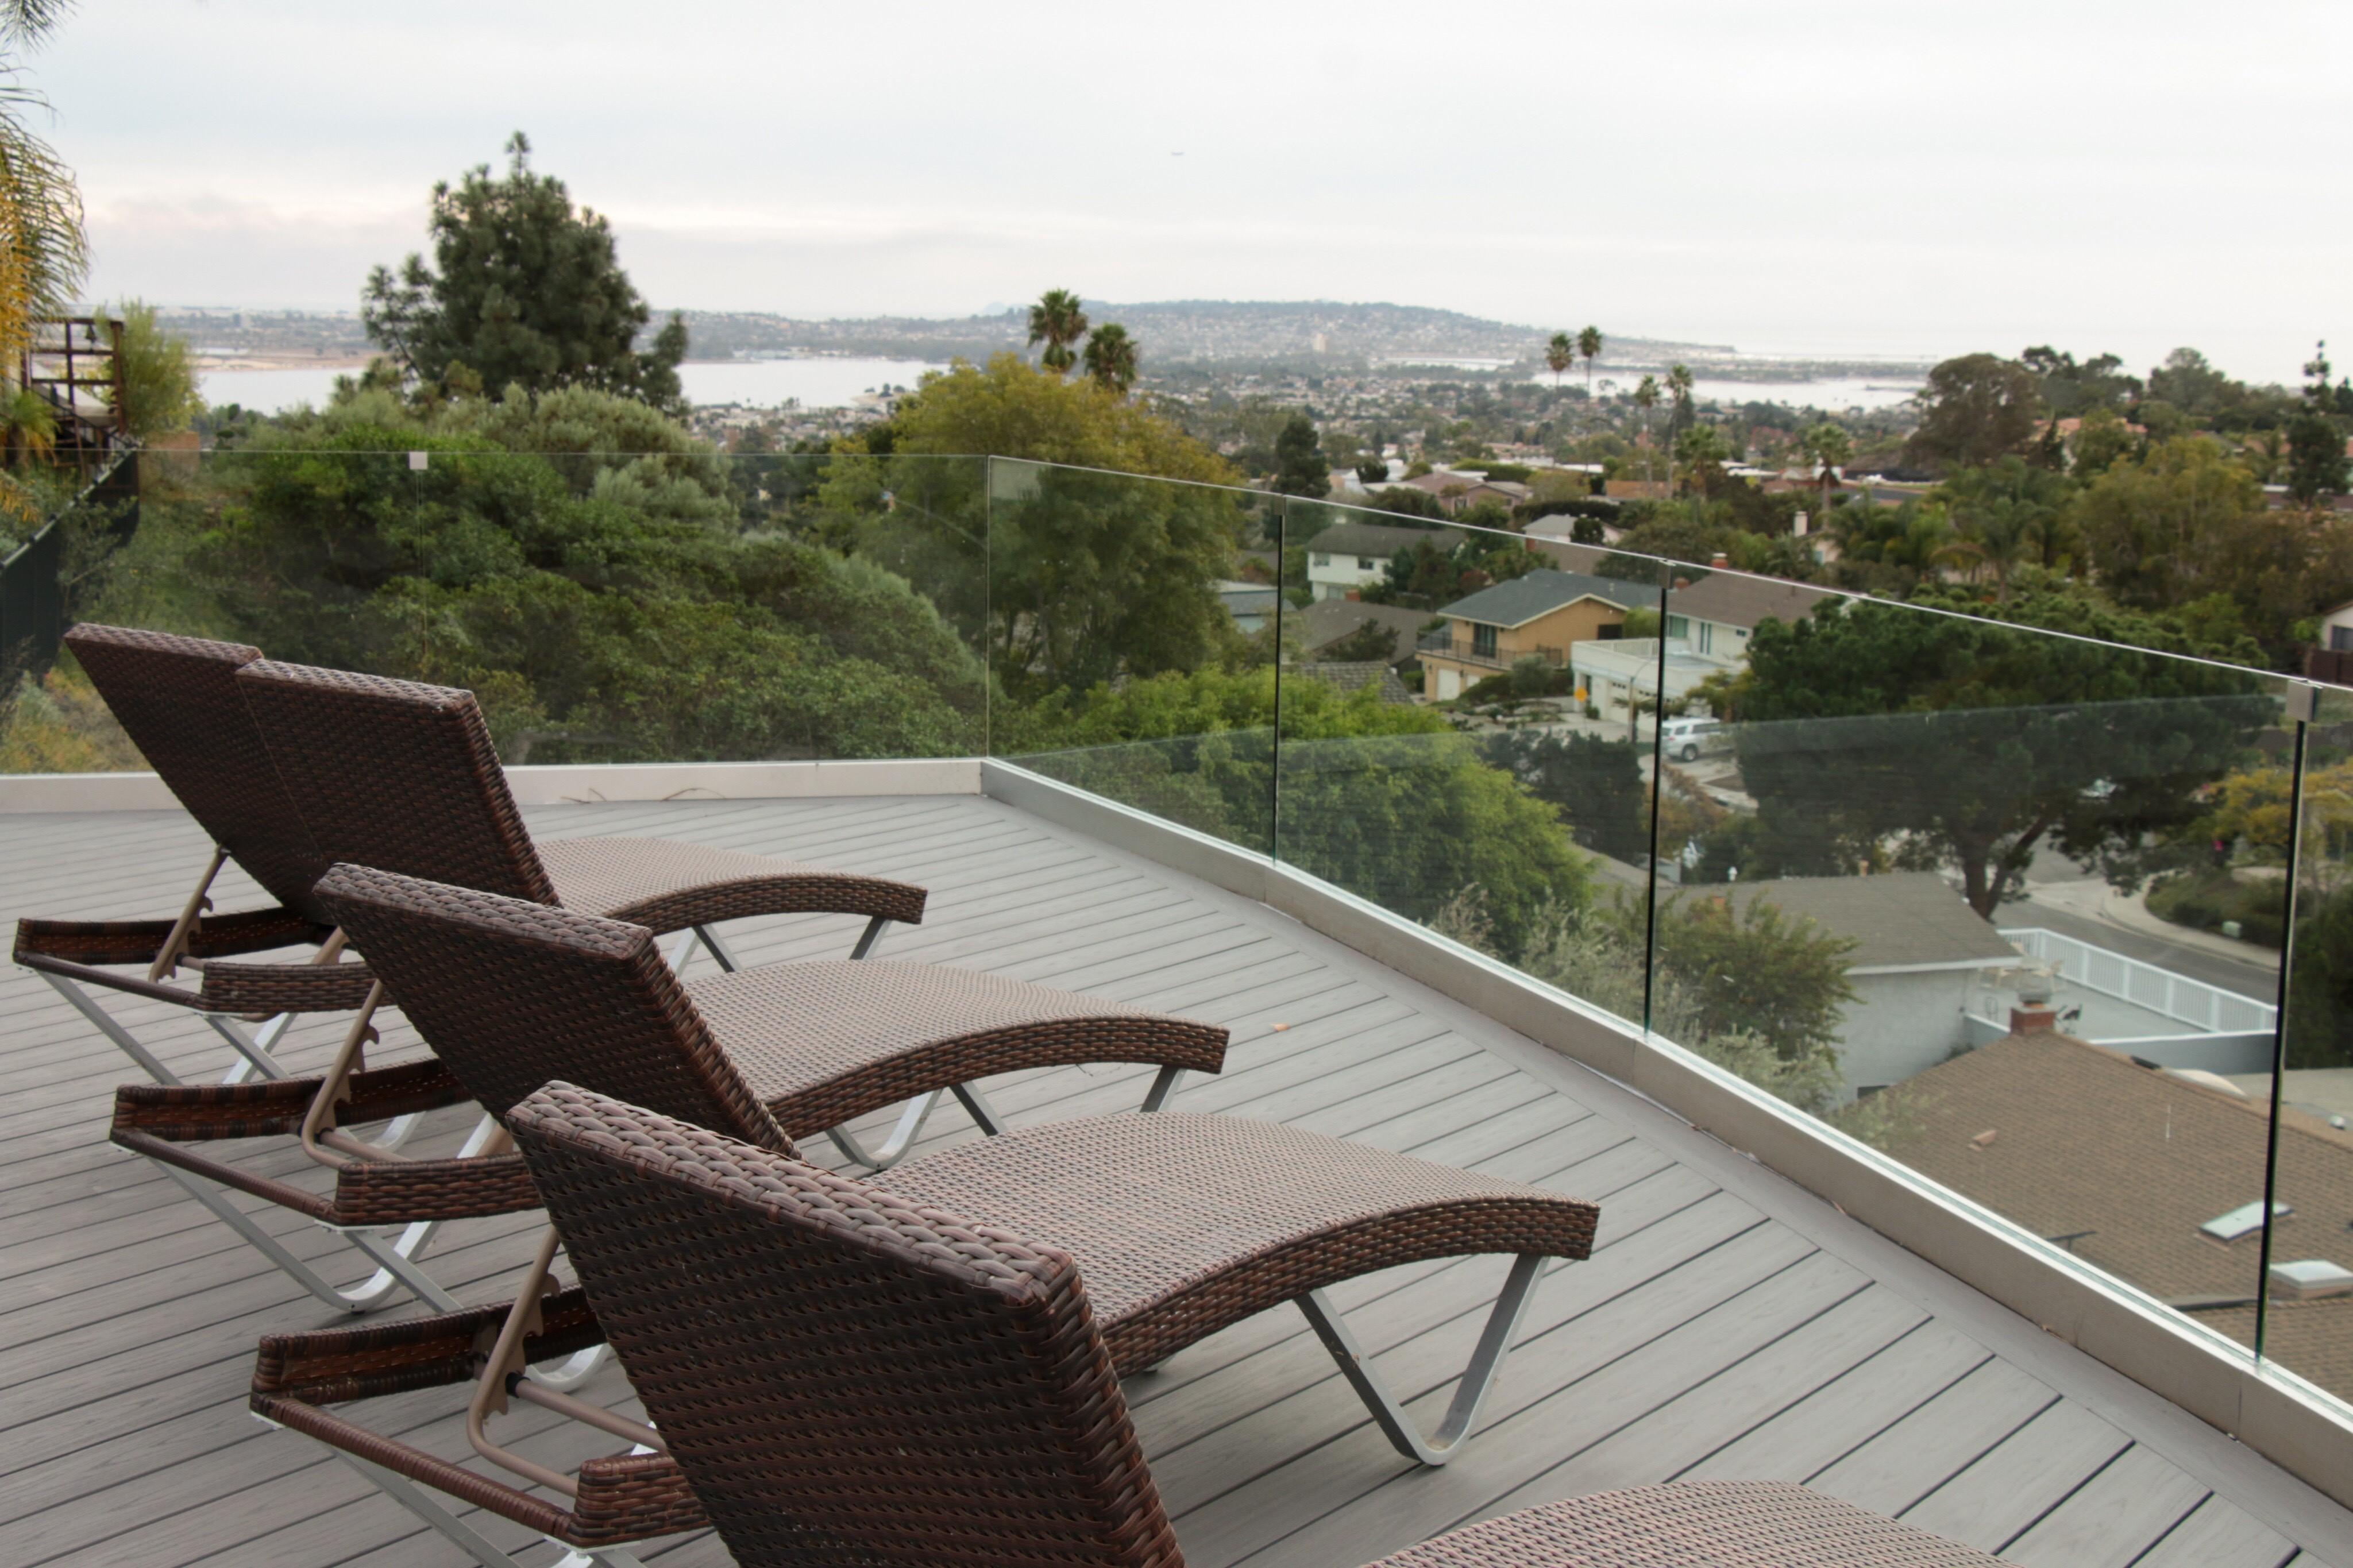 deck builder blake carter selects azek for spectacular sky deck